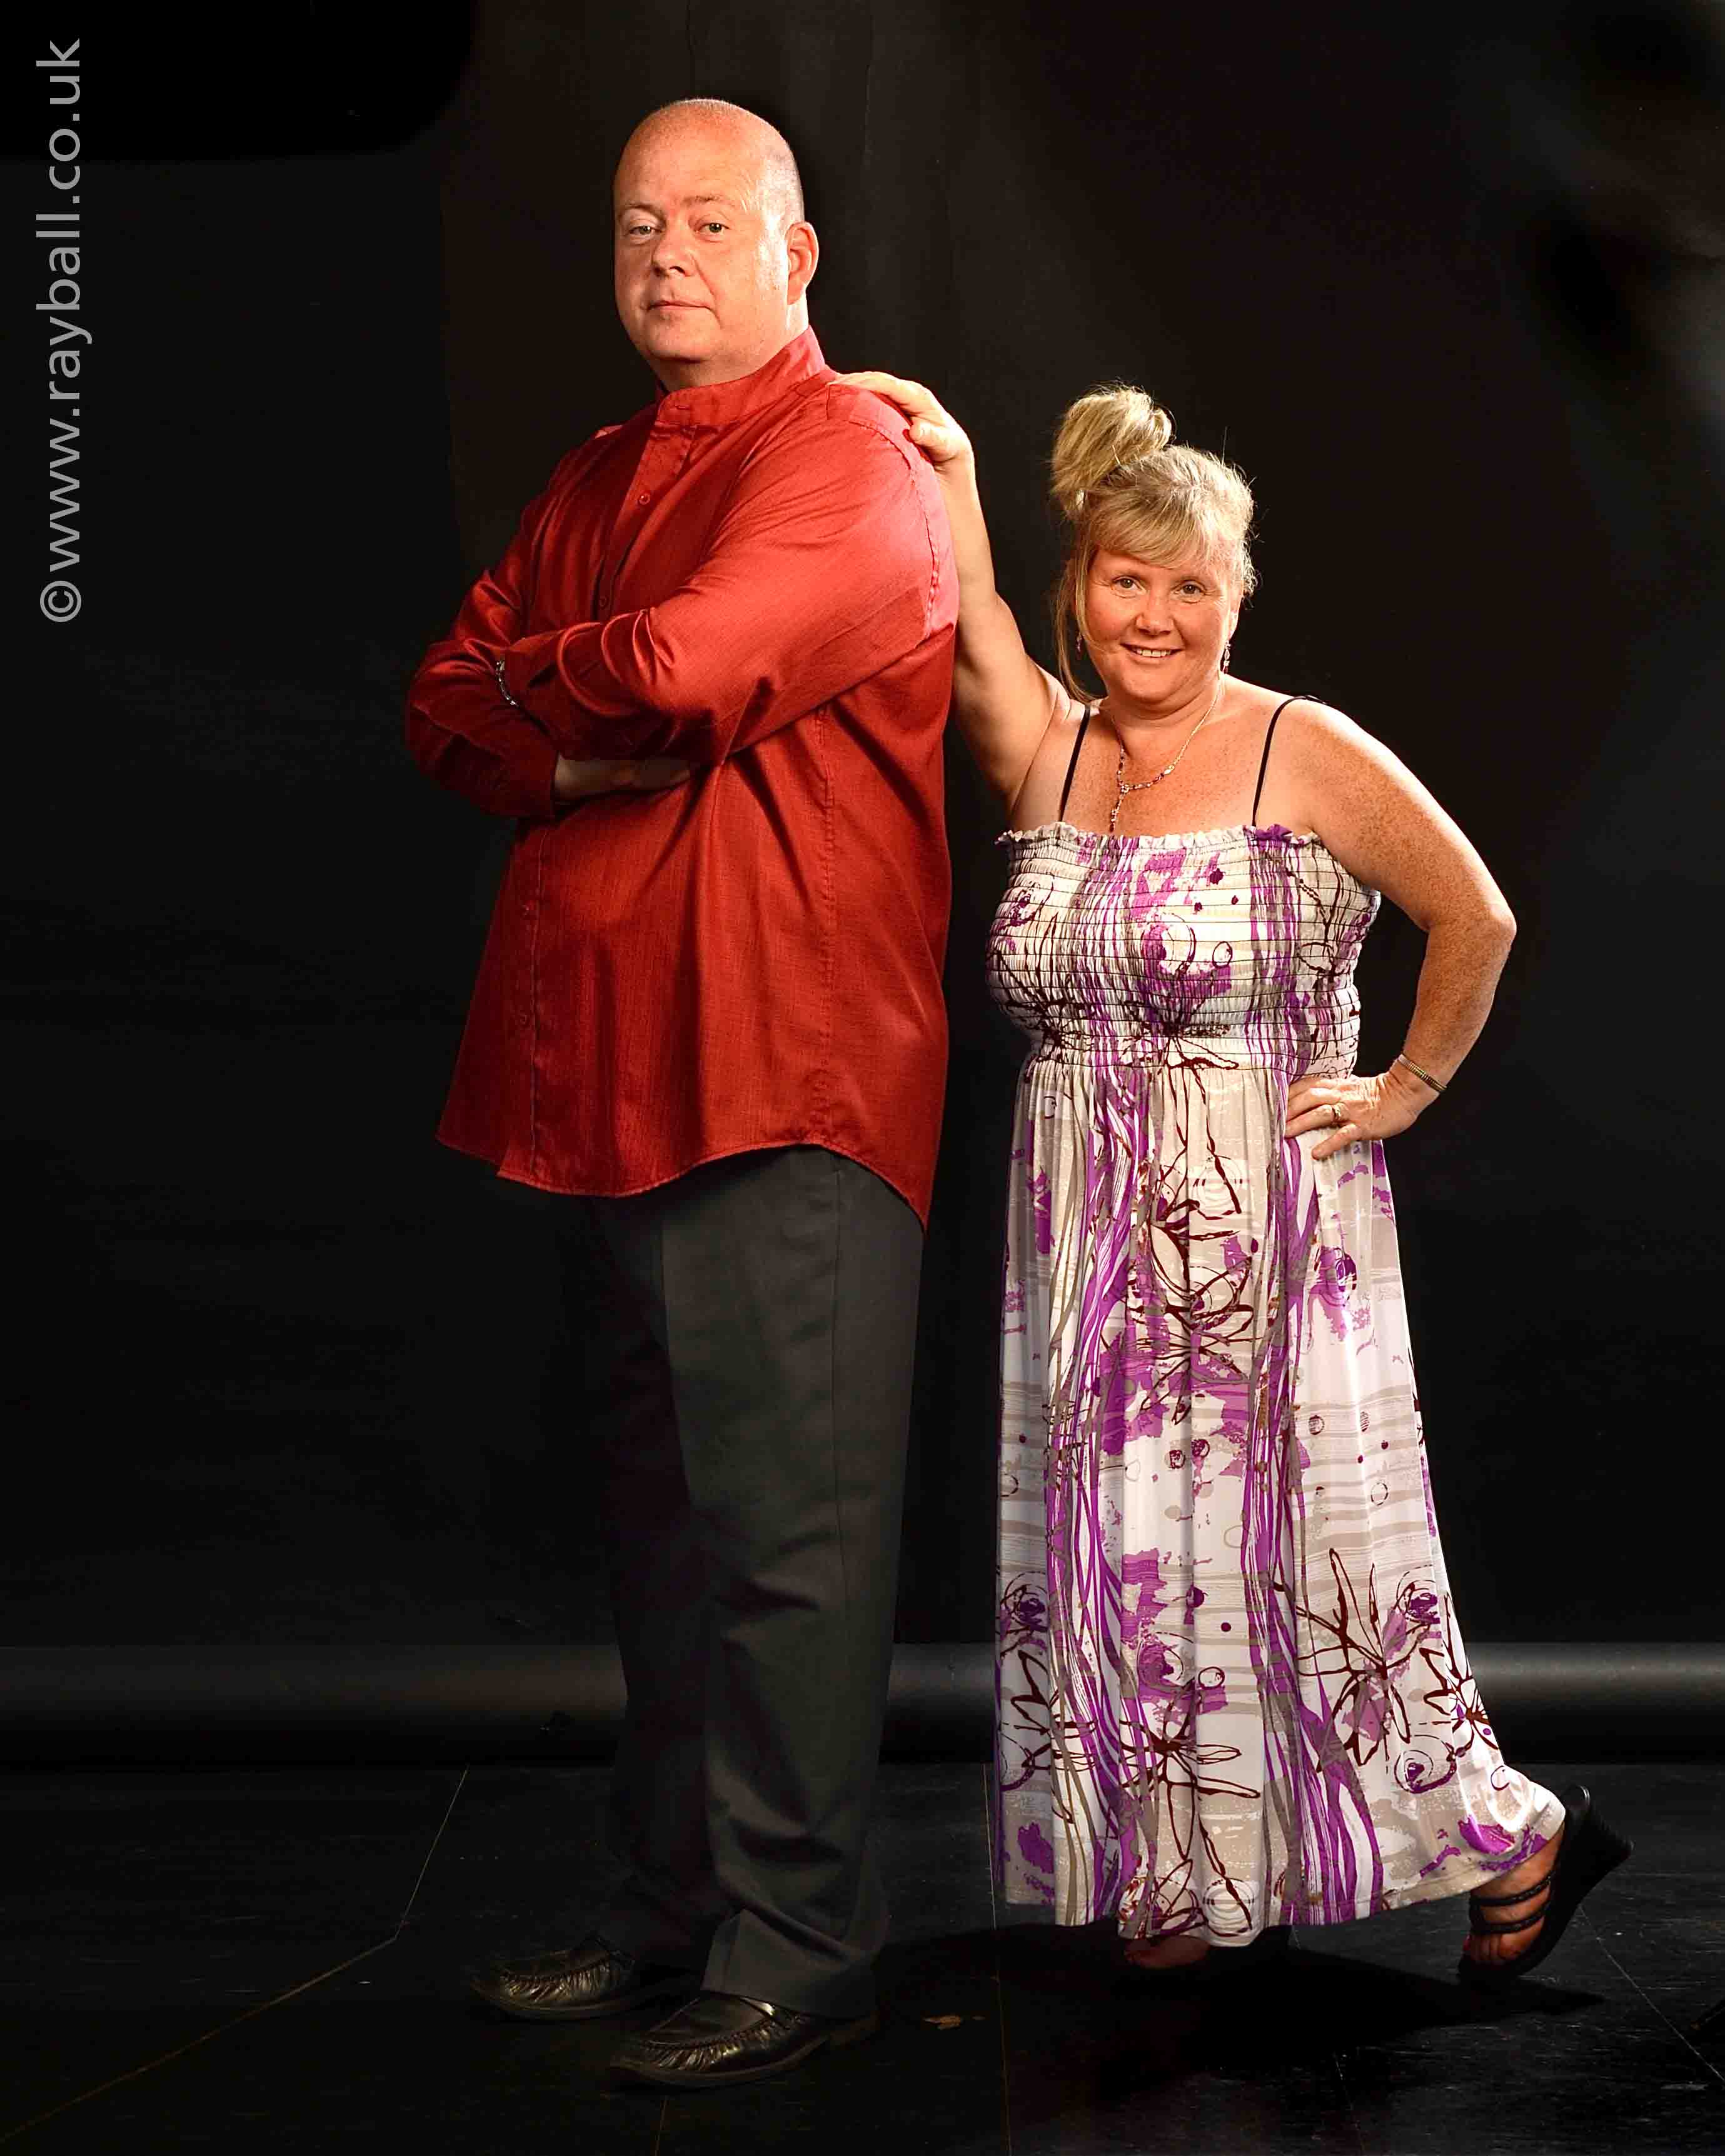 Worcester Park couple having fun posing at Epsom Photography Studio